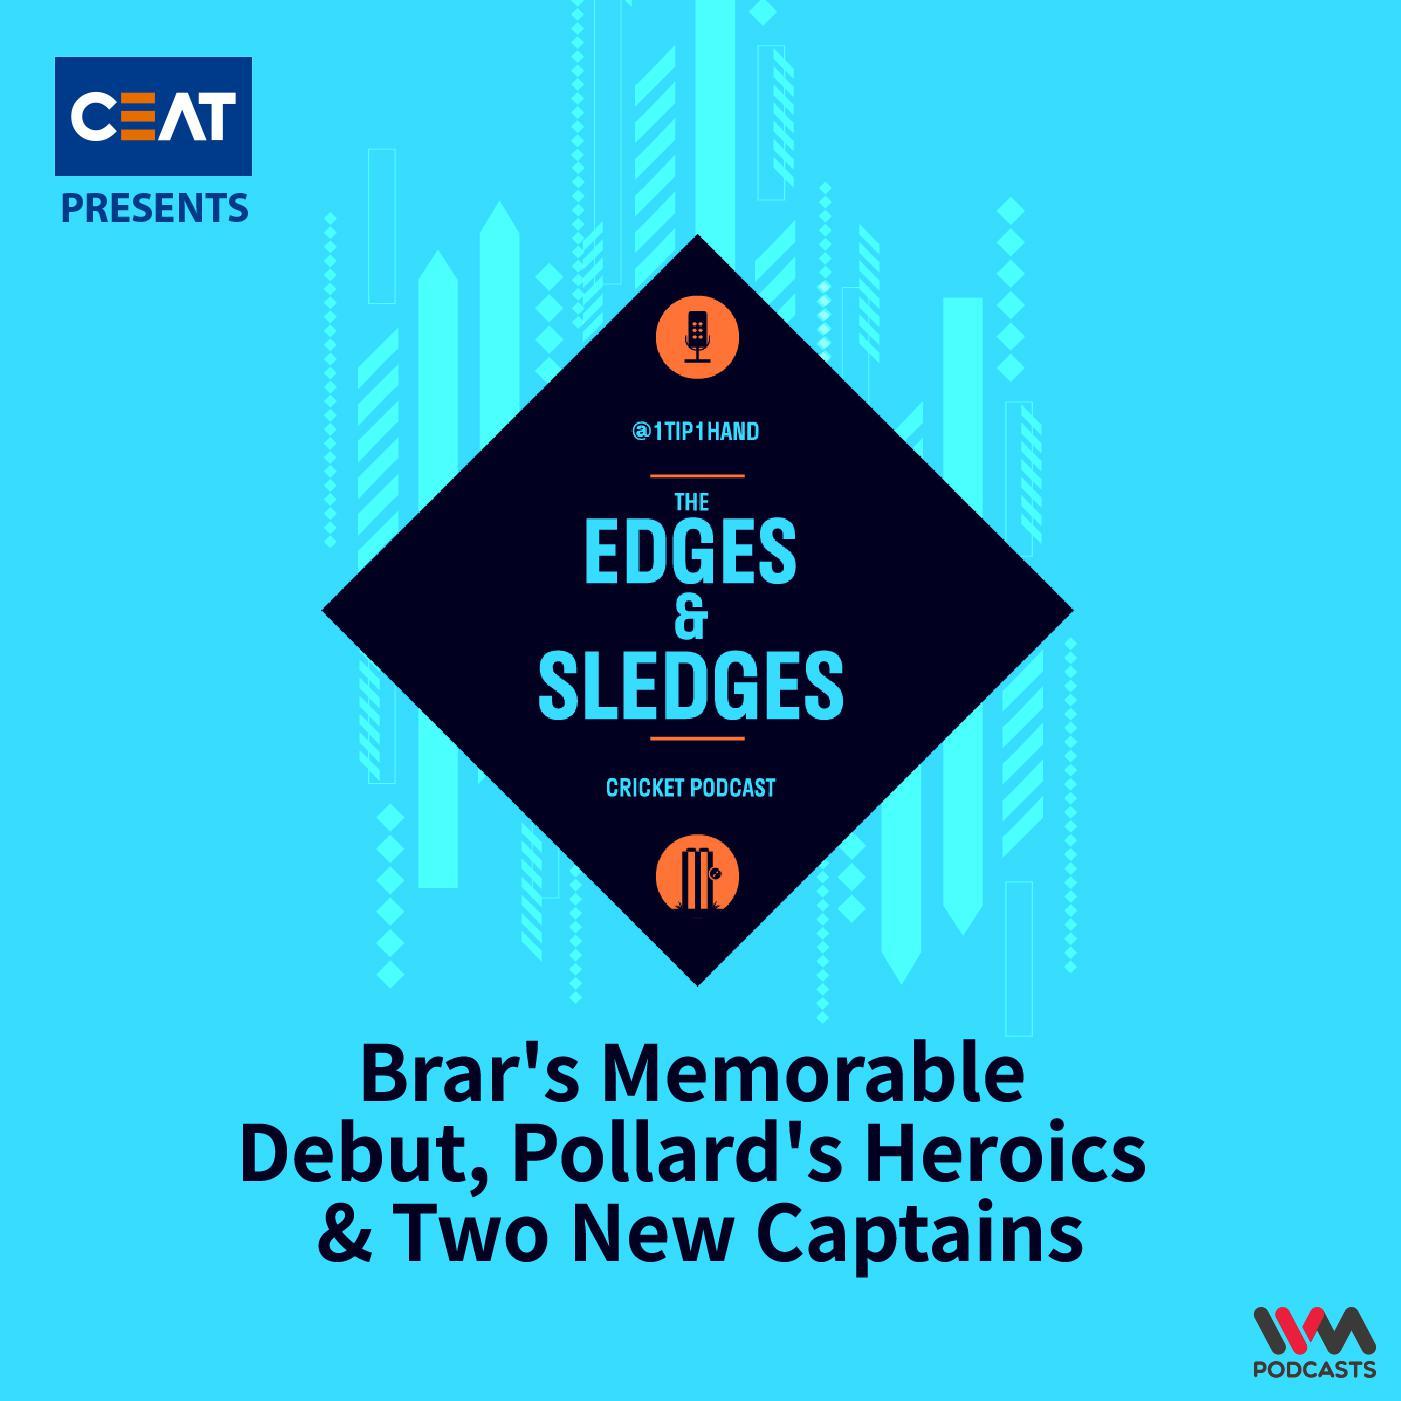 Ep. 172: Brar's Memorable Debut, Pollard's Heroics & Two New Captains